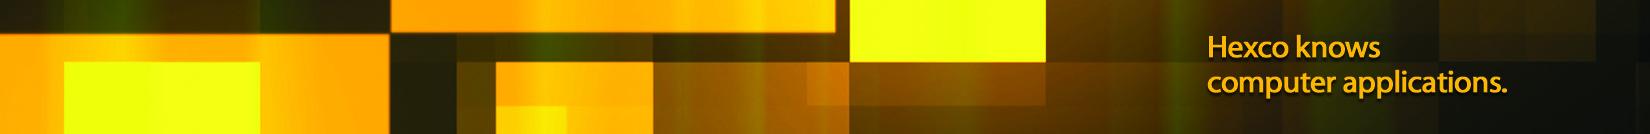 comp-apps-banner-2020.jpg